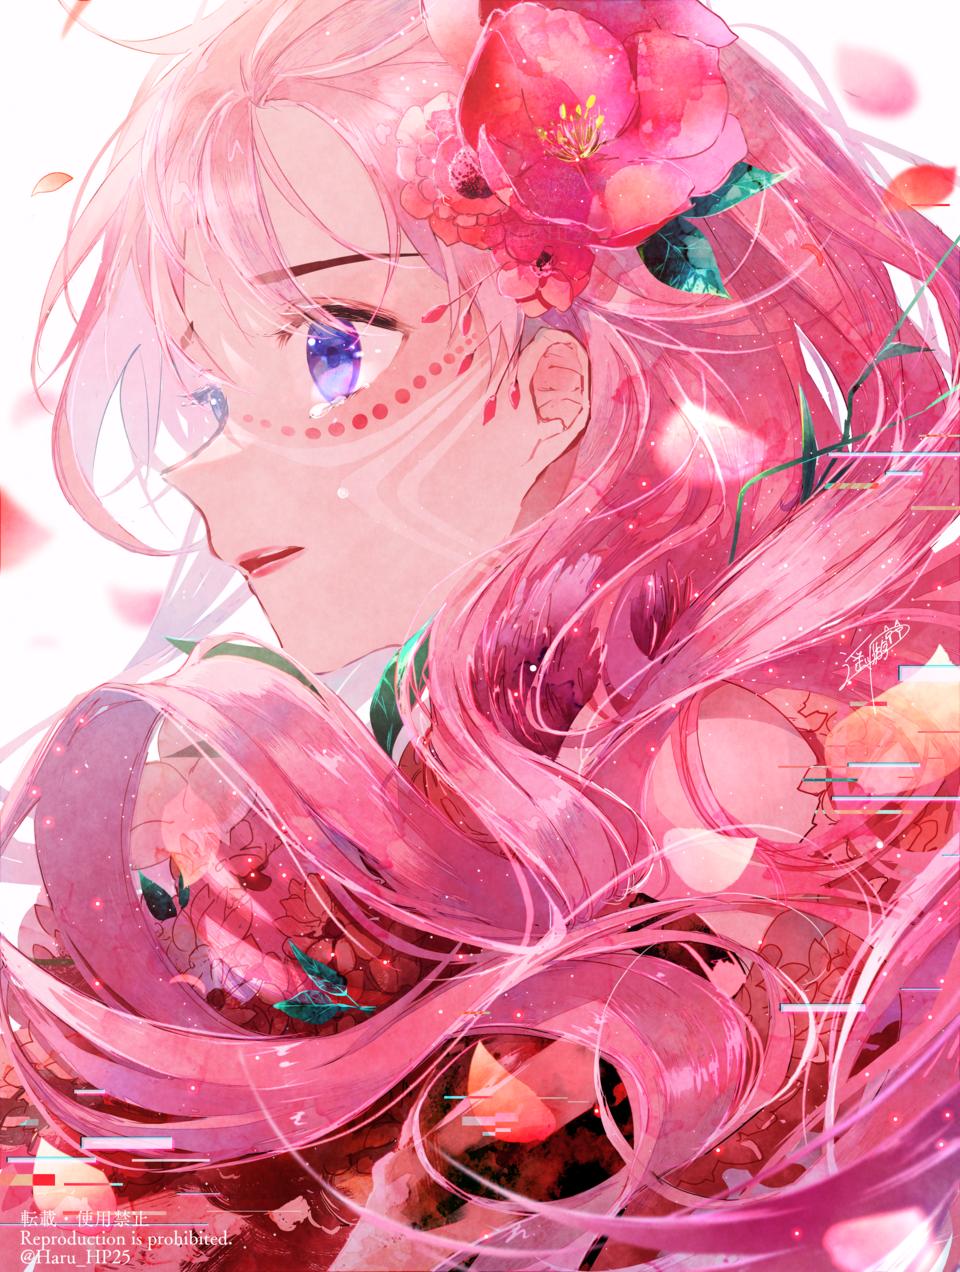 Belle Illust of 遥川遊 illustration 竜とそばかすの姫 fanart movie おんなのこ pink watercolor sideface flower art